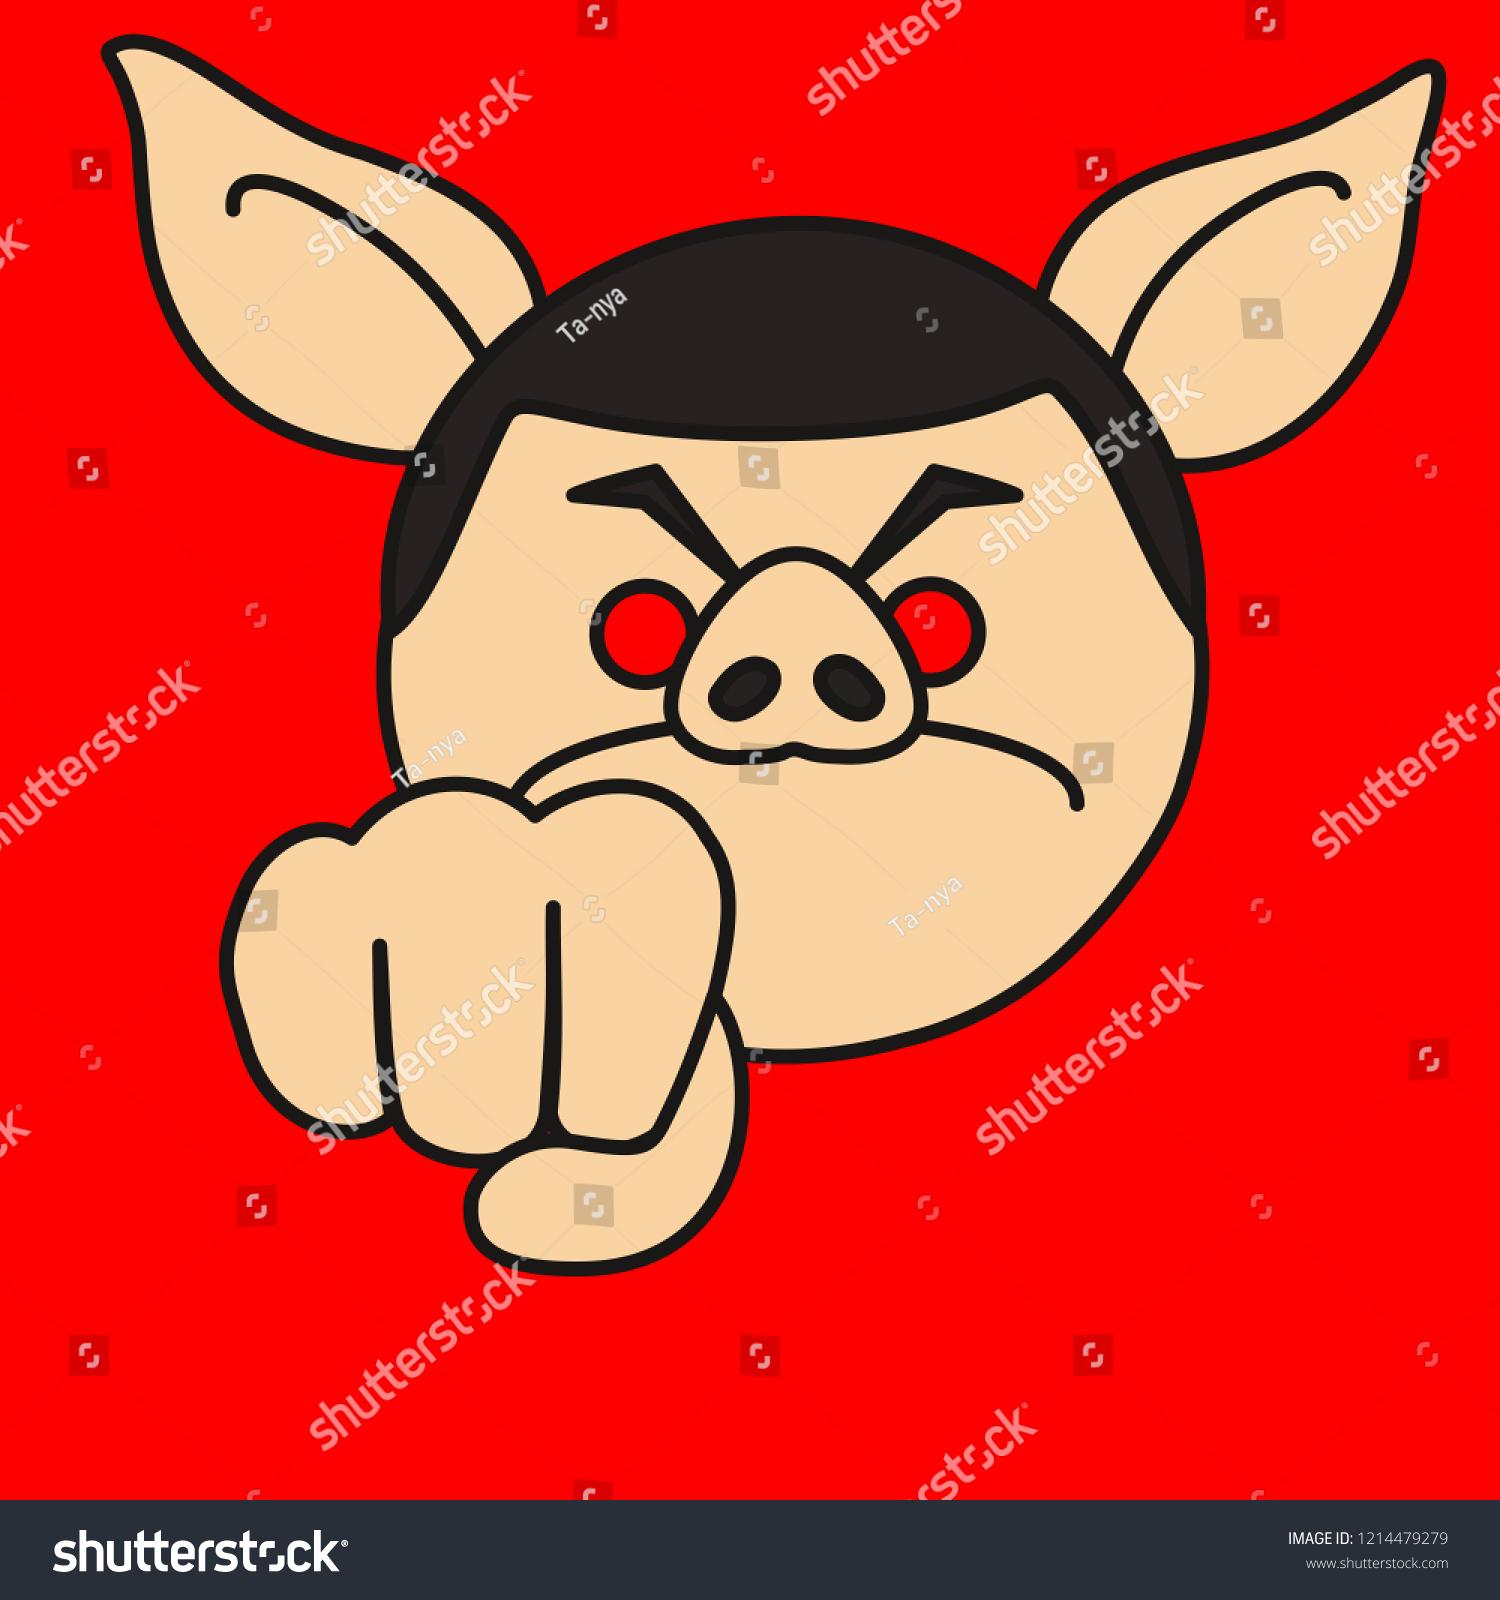 angry fist emoji www